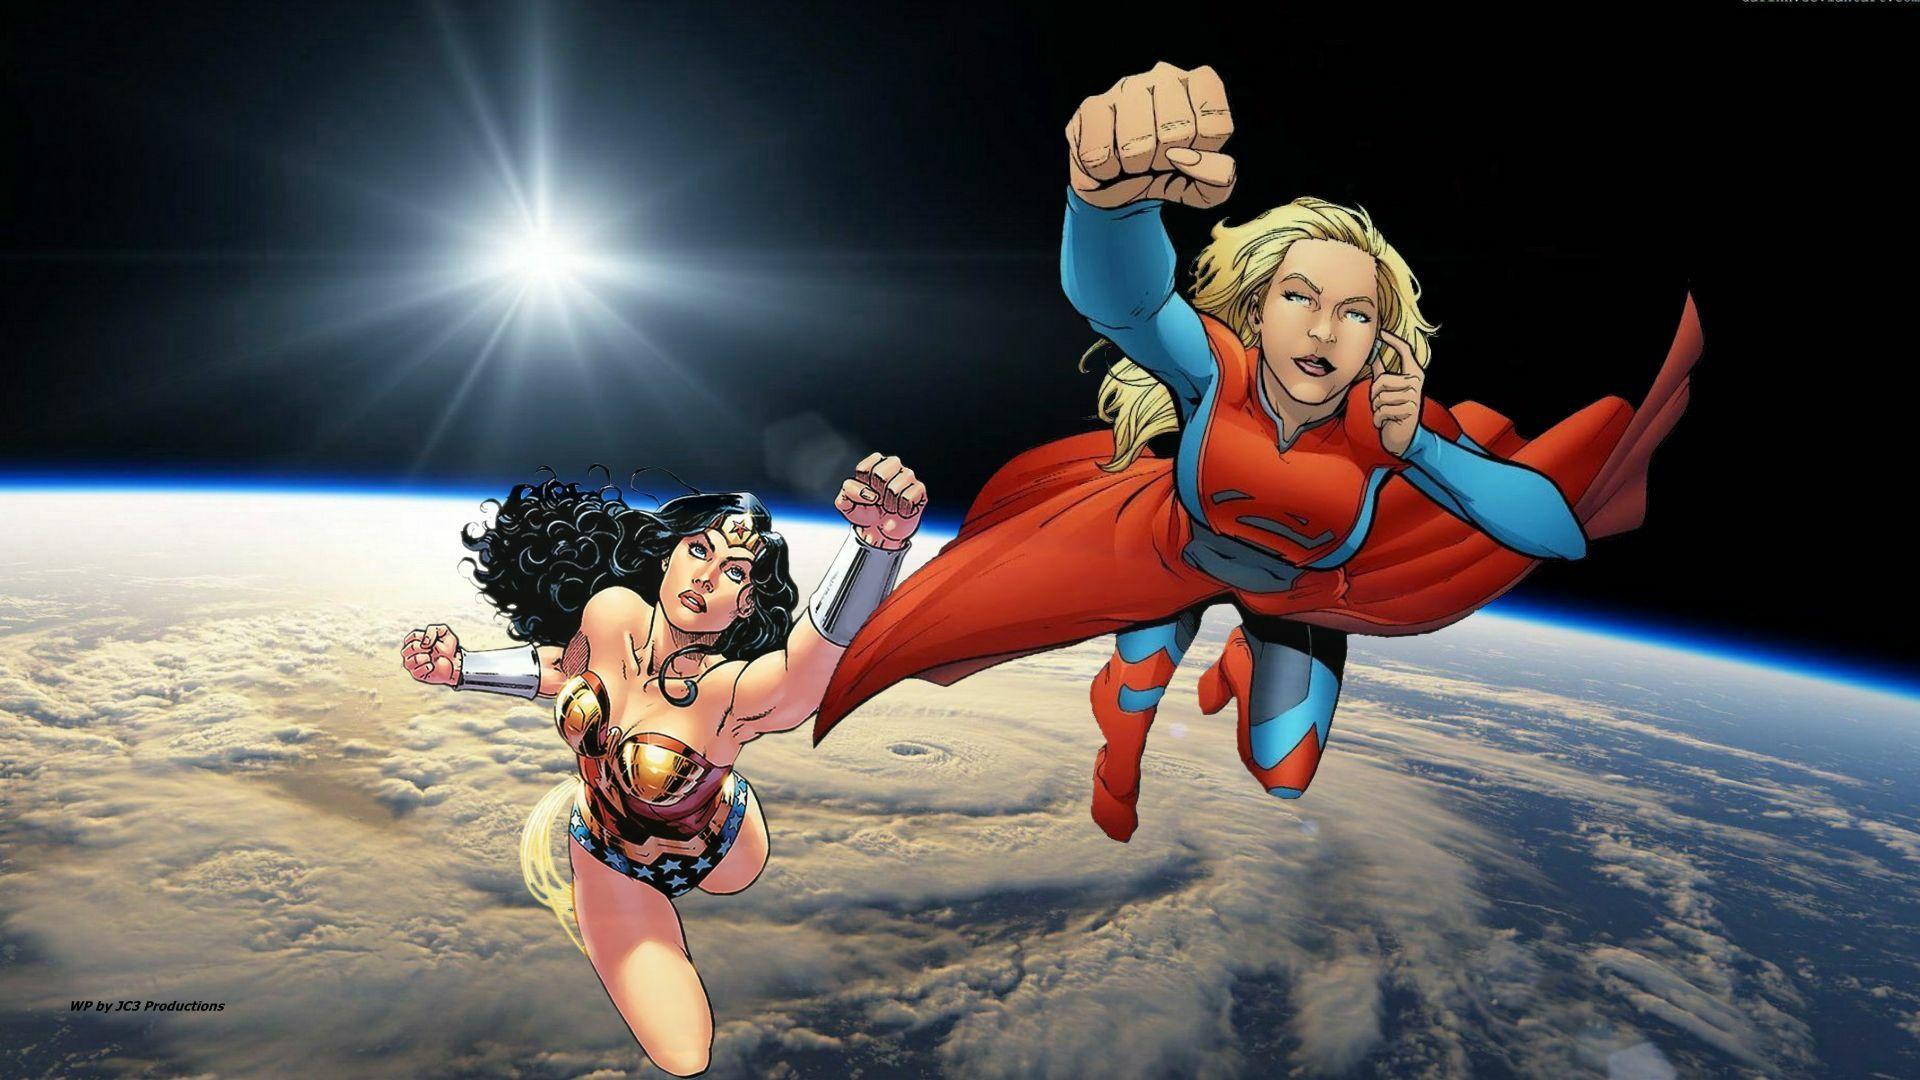 Wonder Woman Supergirl In Space Wallpaper Wonder Woman Supergirl Superhero